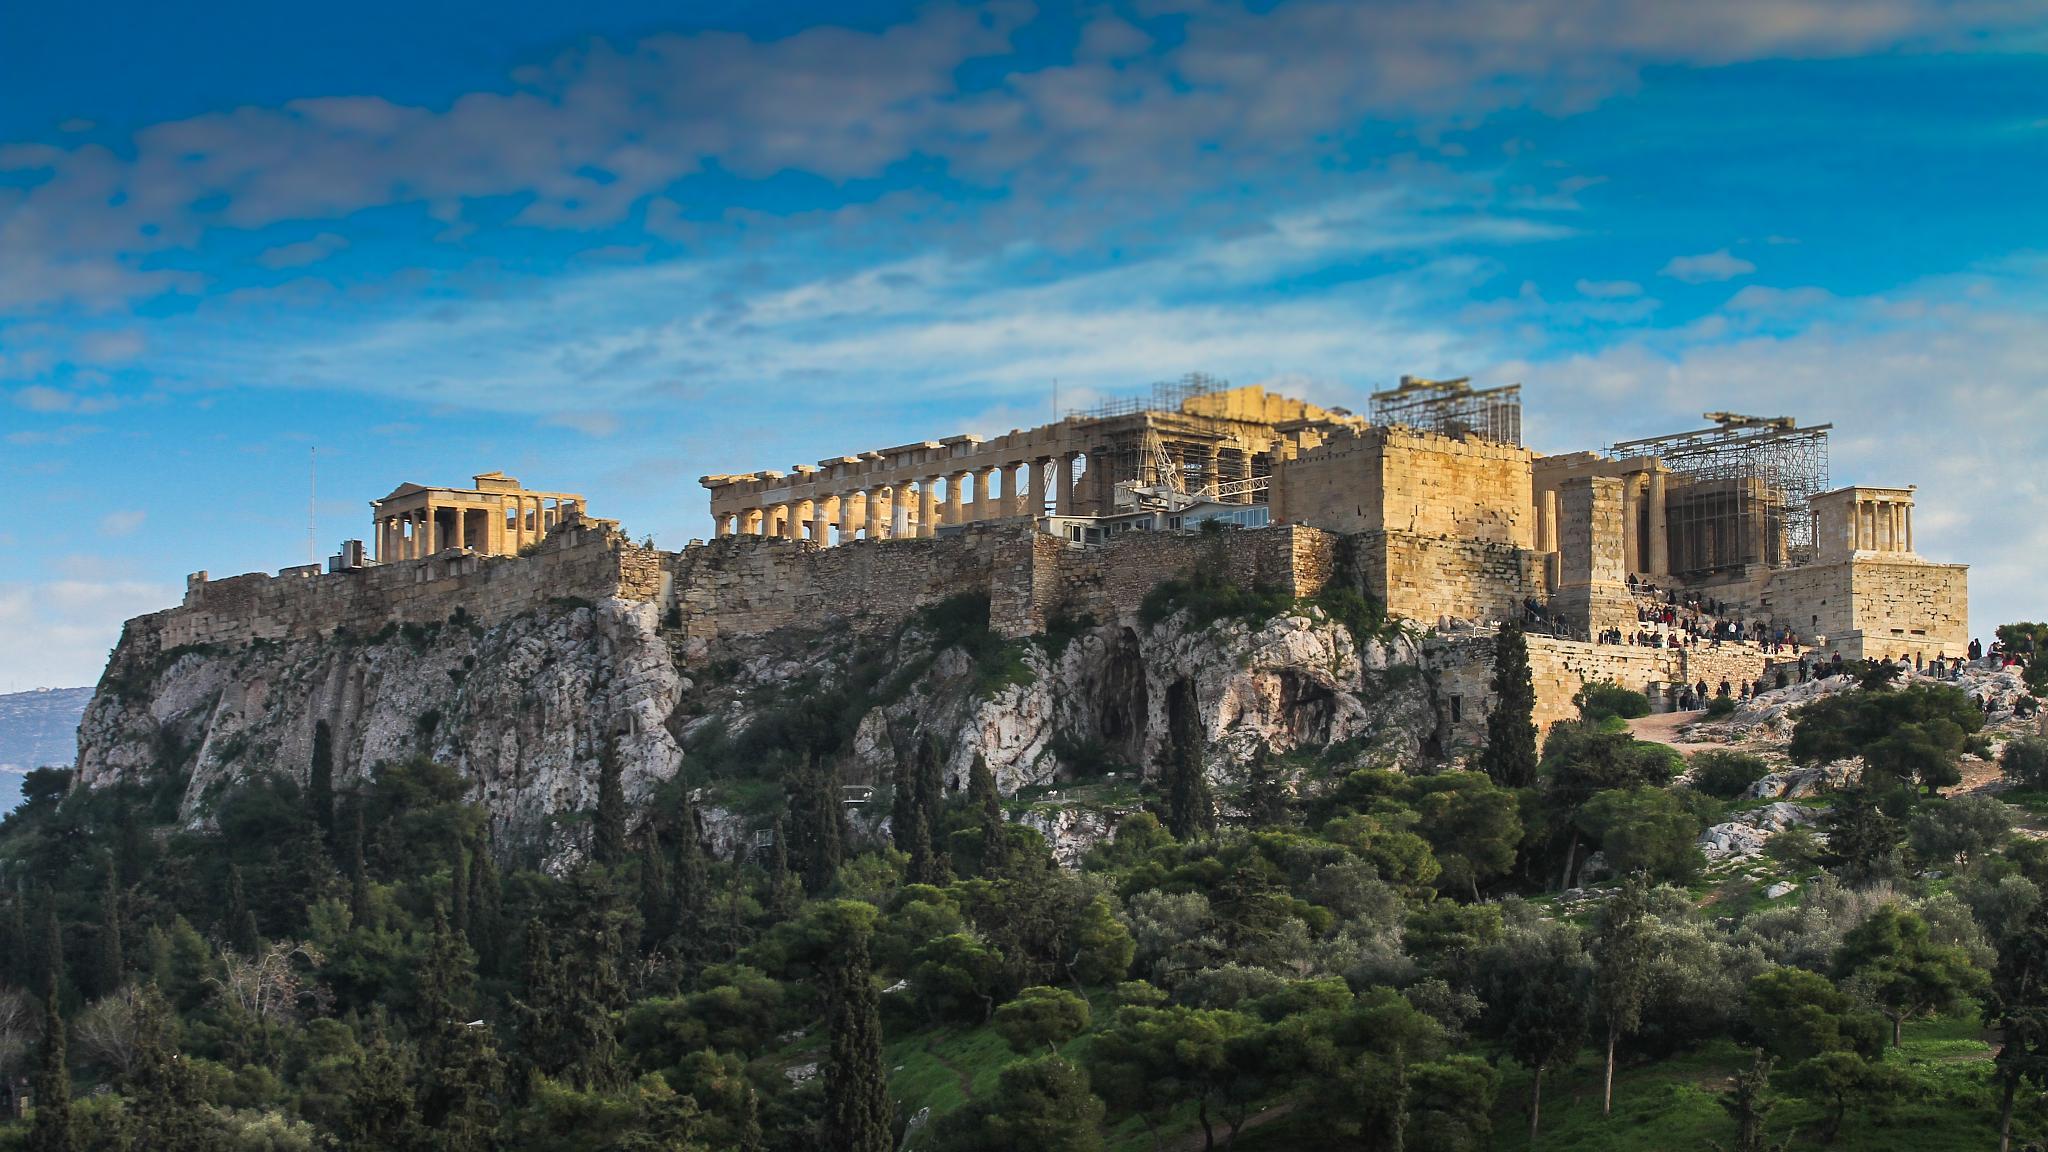 Acropolis by George K. Stamatoukos